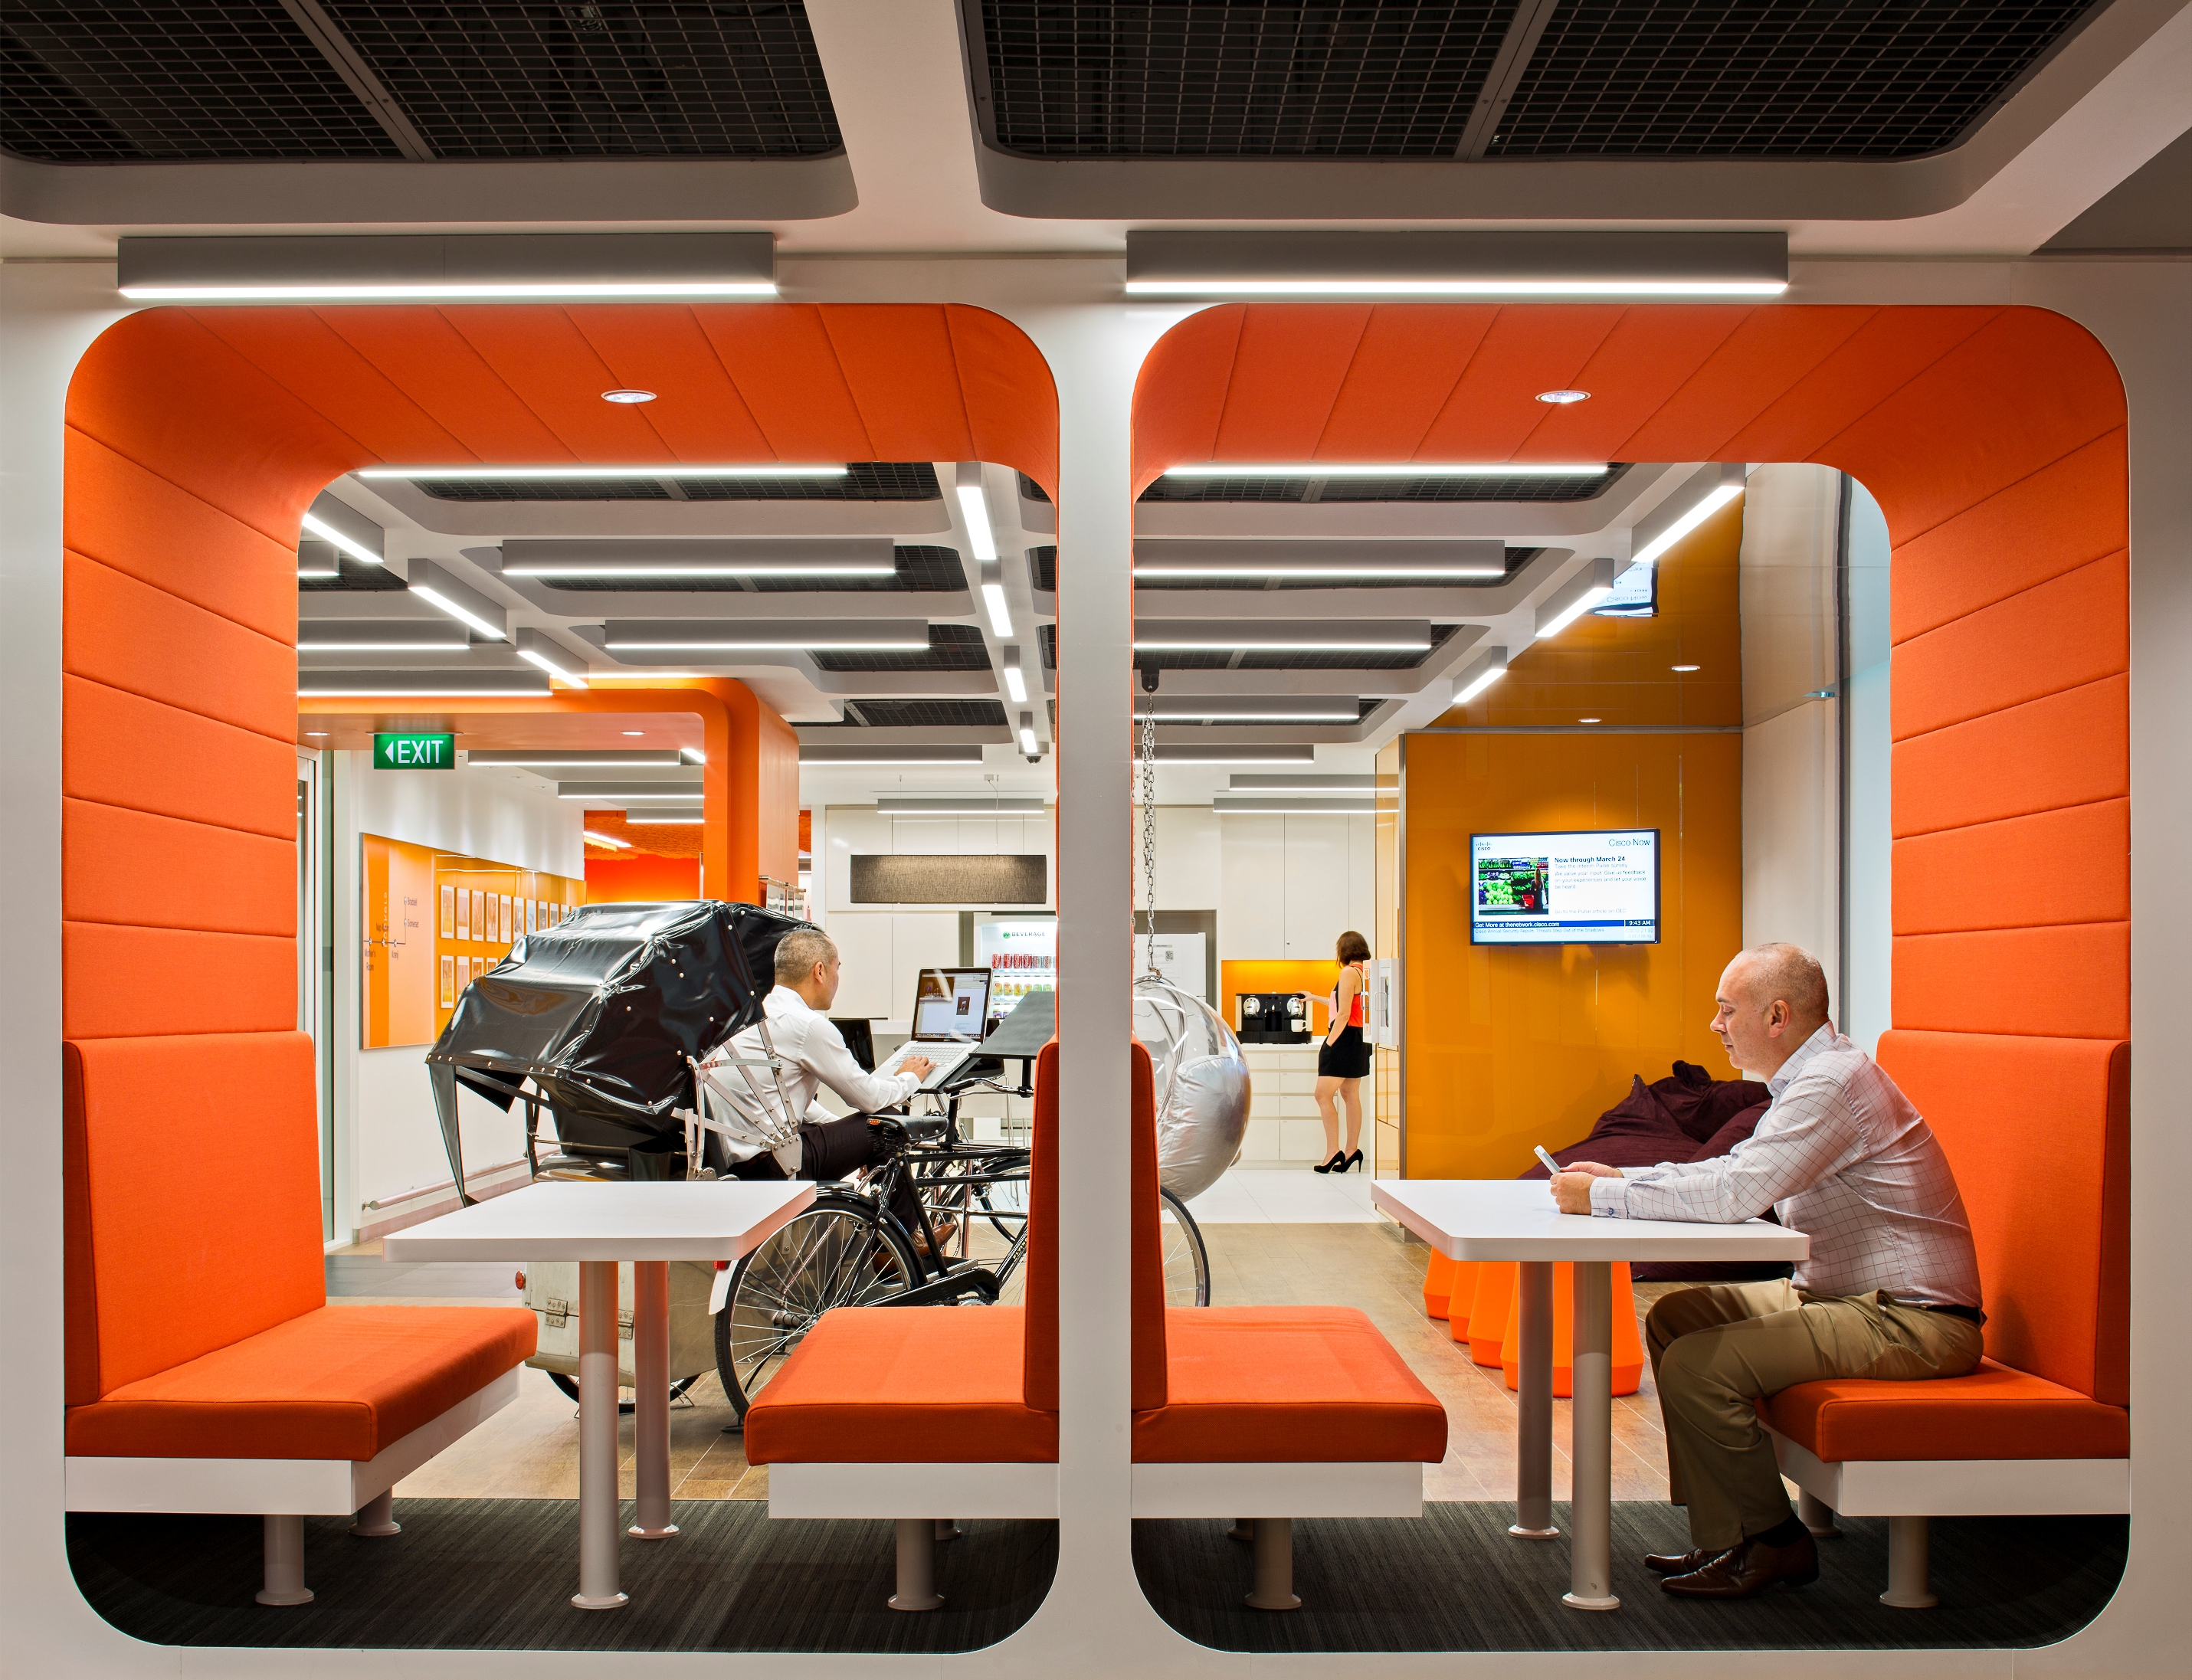 cisco office san francisco. SabrinaZolkifi_Jun2013_Cisco SG Office_People_3 Office_People_1 Cisco Office San Francisco